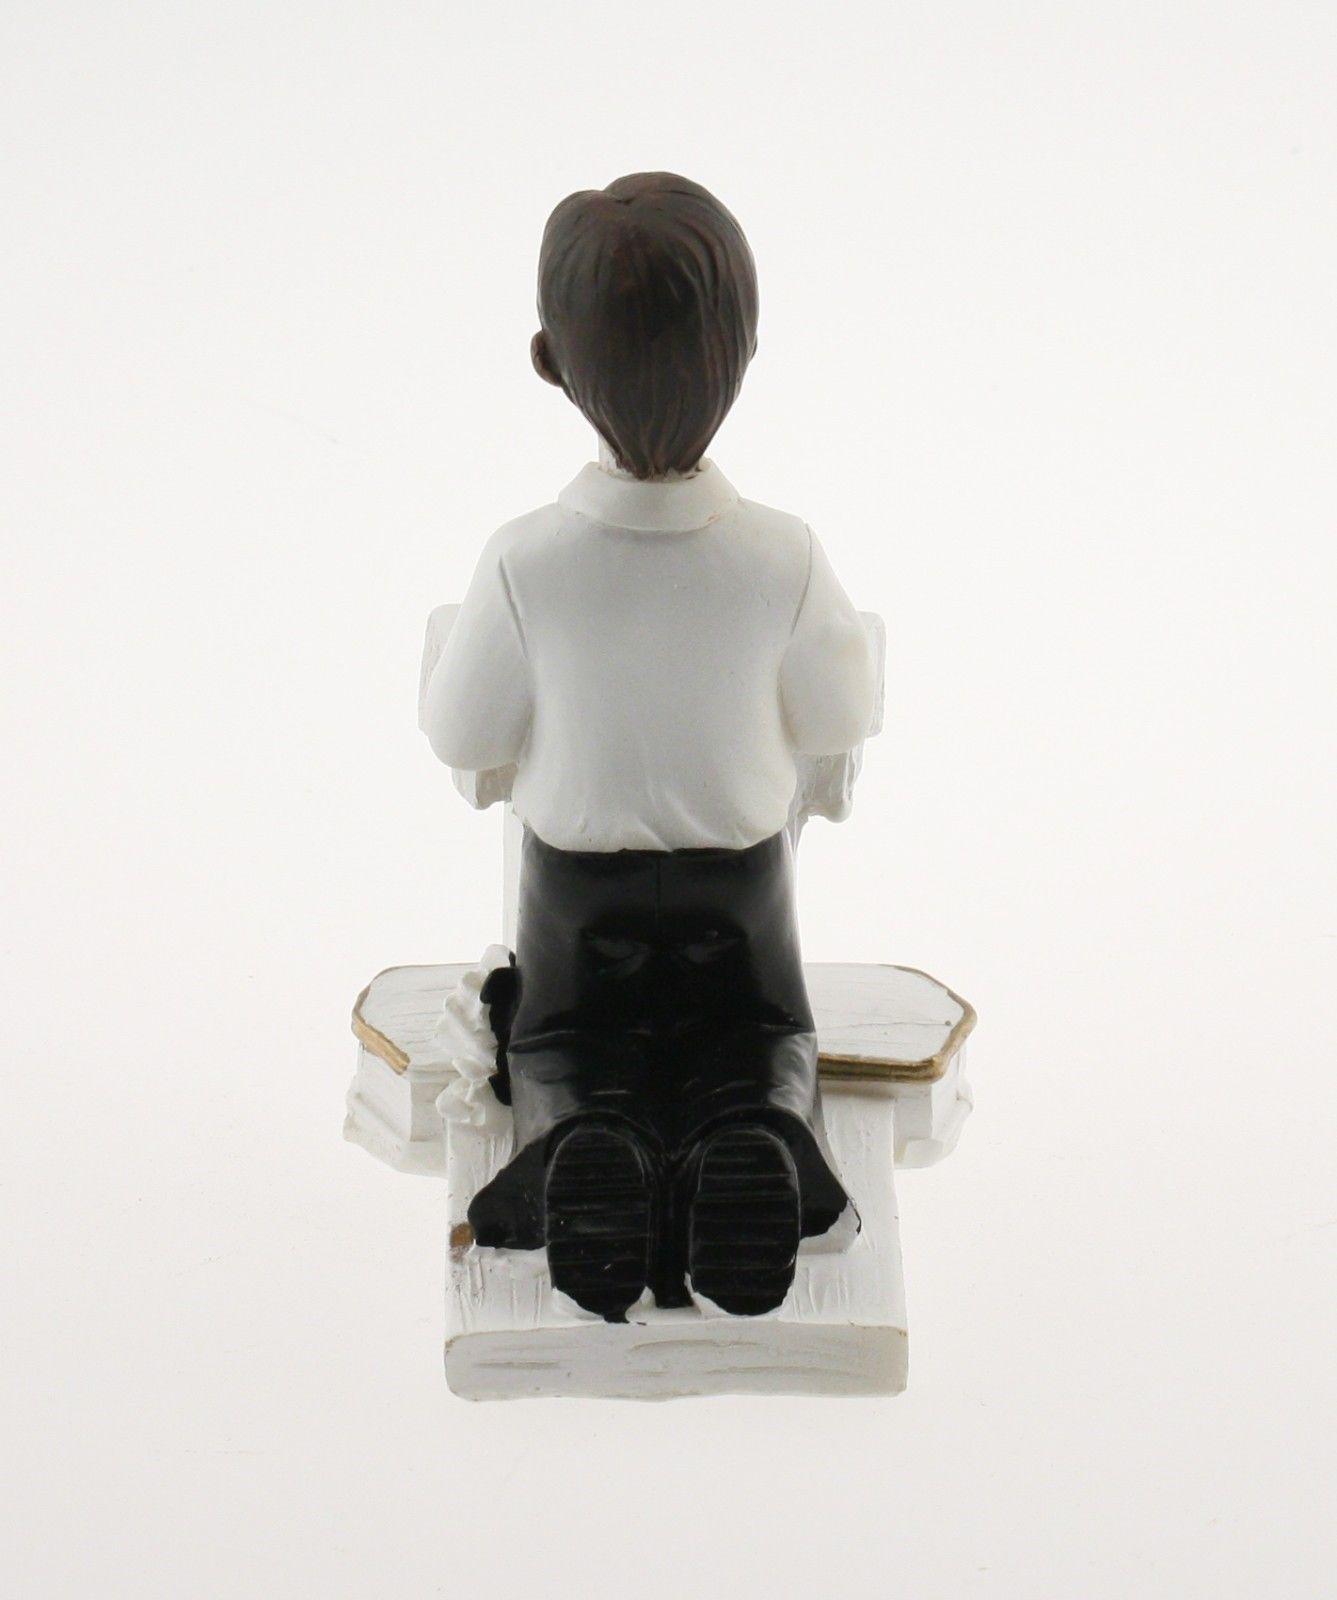 "Kneeling Communion Boy podium bible statue cake topper decoration 4"" tall"